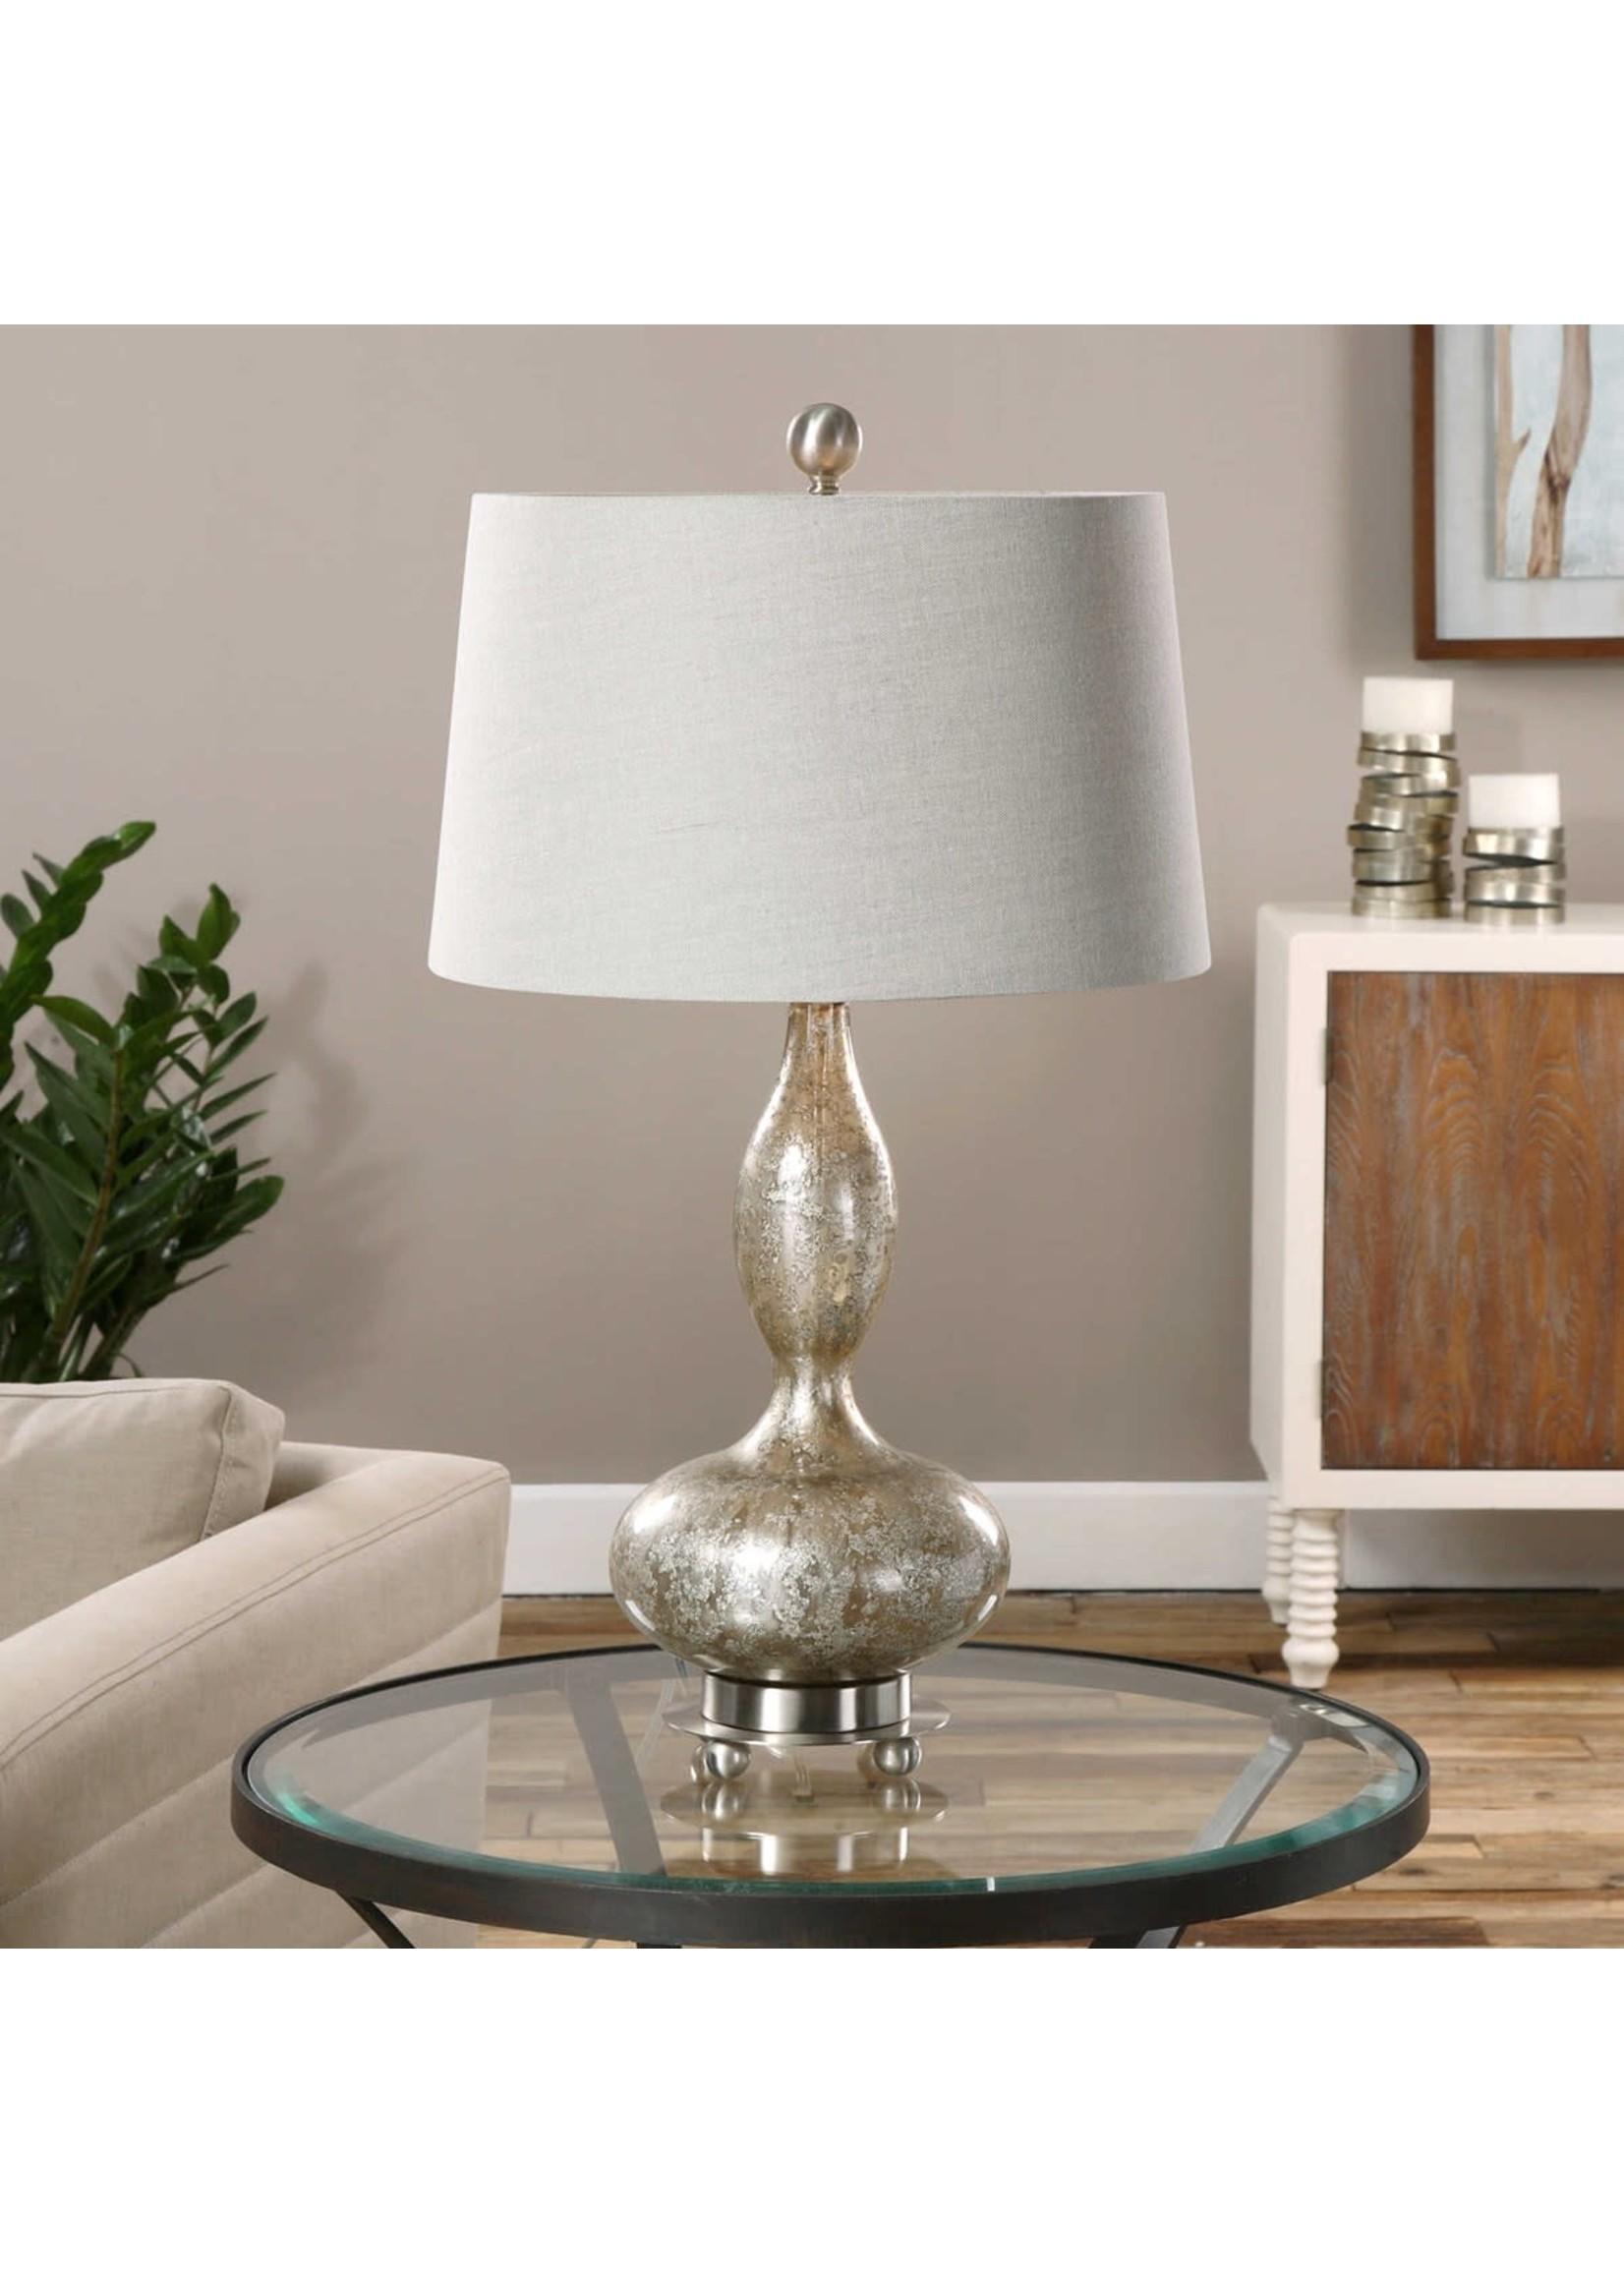 Vercana Table Lamp